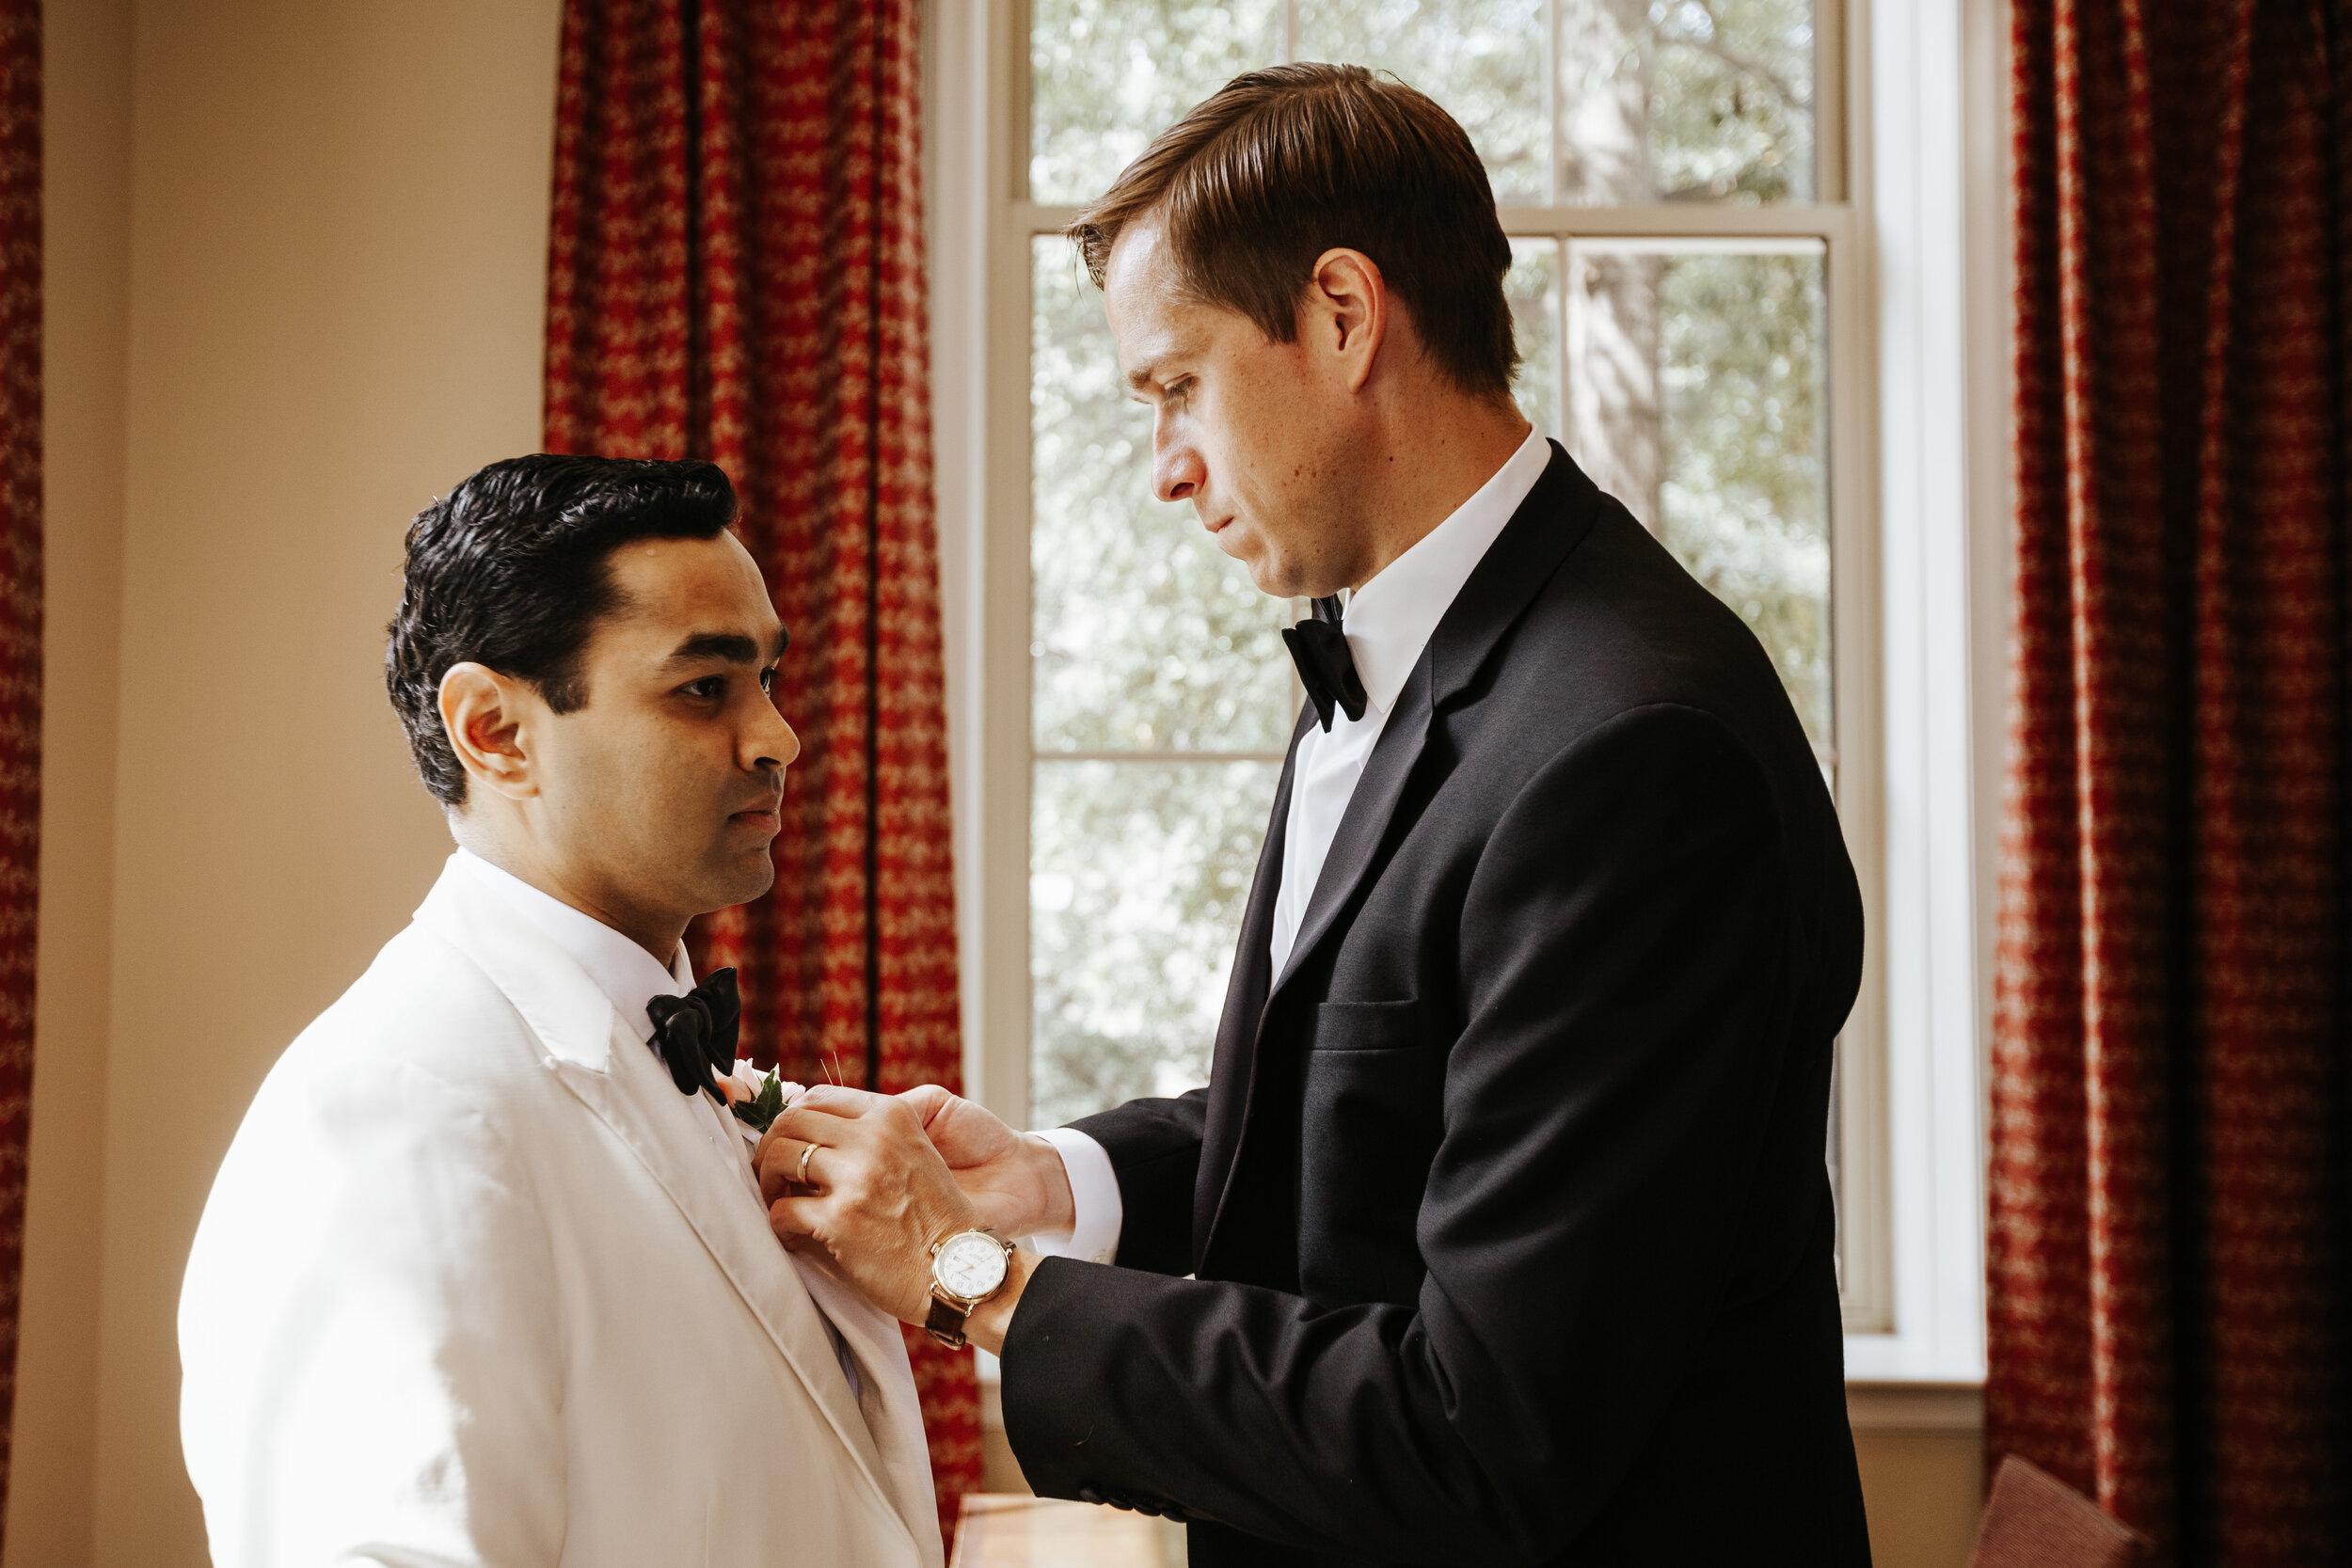 Cassie-Mrunal-Wedding-Quirk-Hotel-John-Marshall-Ballrooms-Richmond-Virginia-Photography-by-V-28.jpg